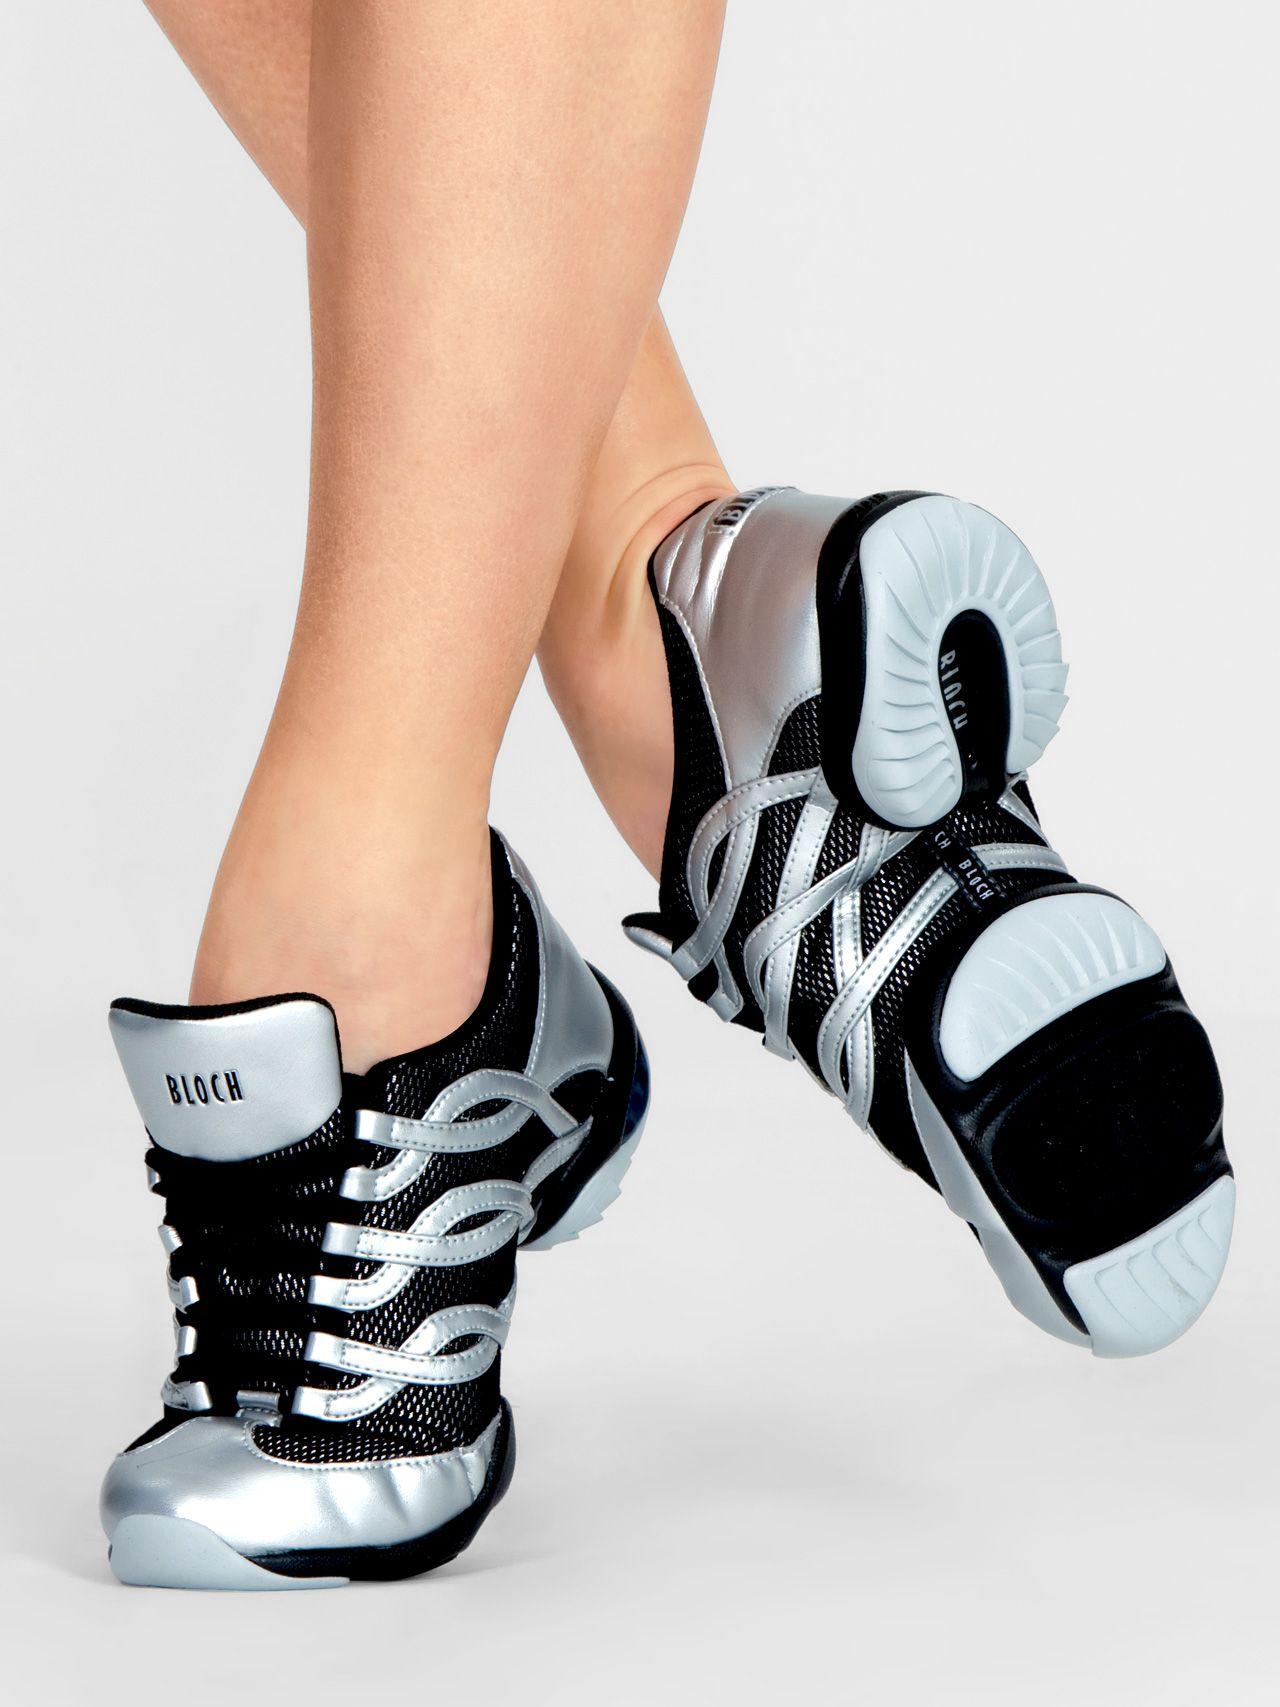 Kids Ballet Shoes